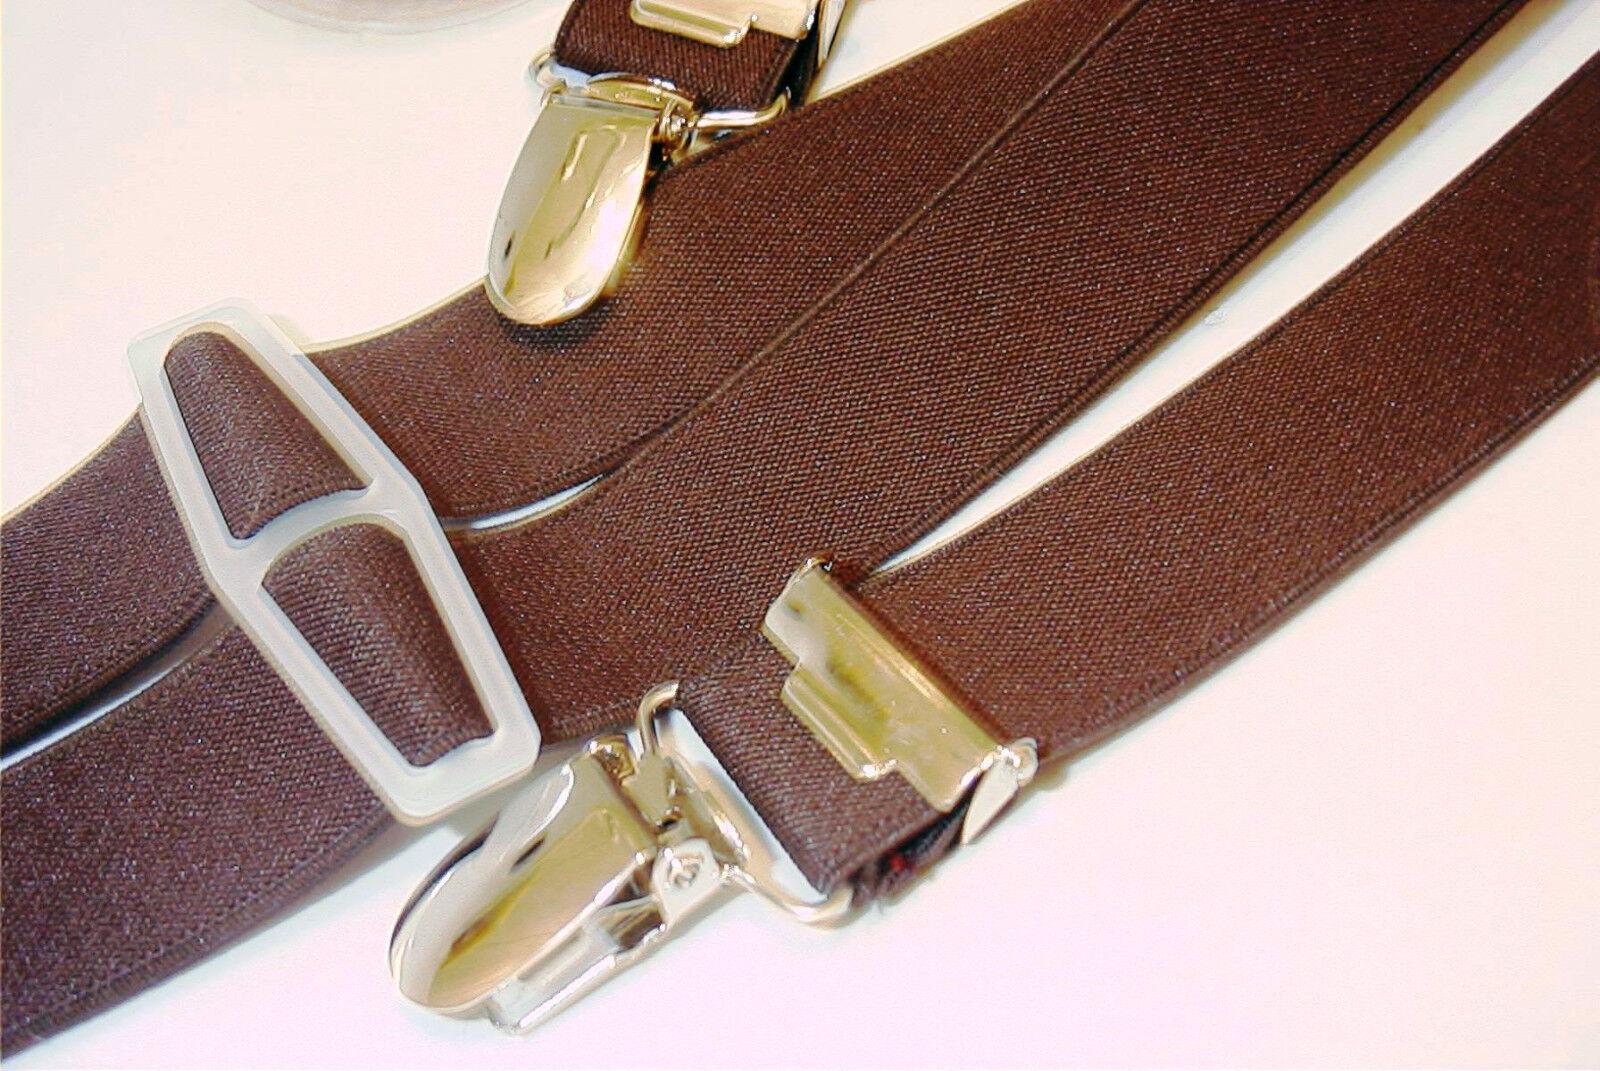 elastischer Hosenträger 25mm breit, eigene Fertigung